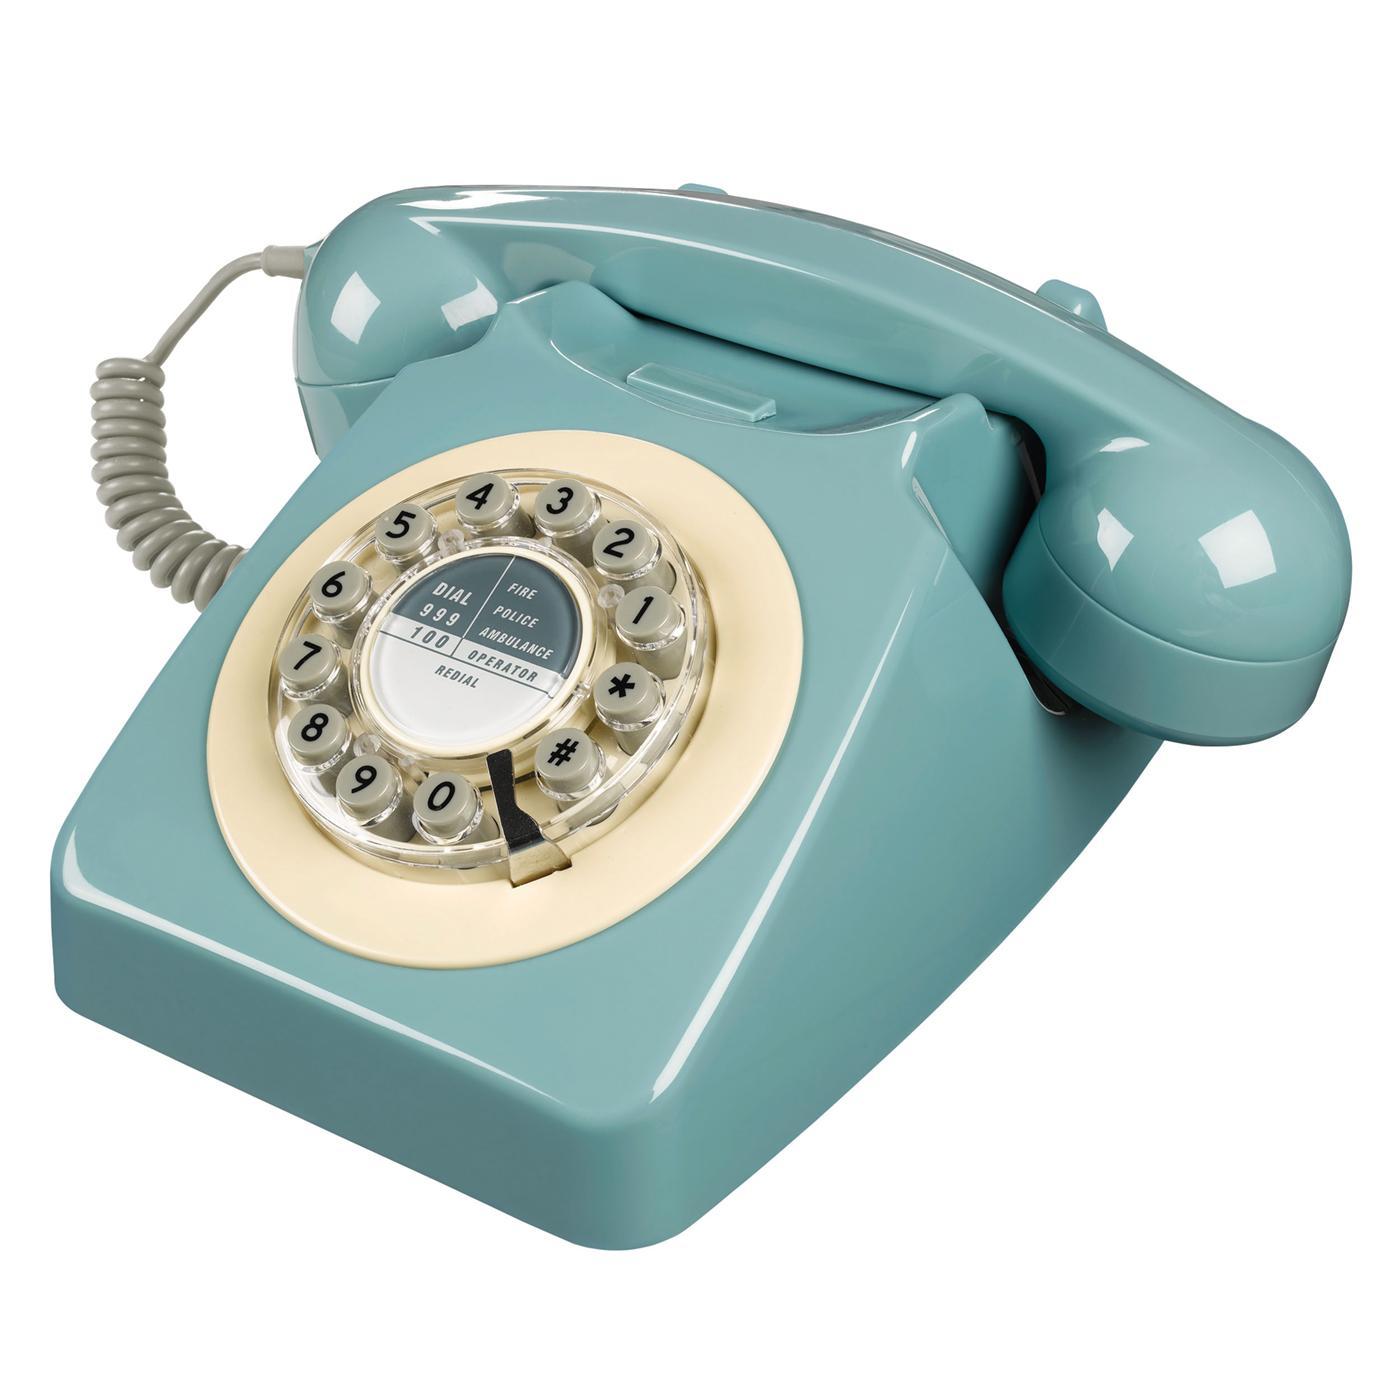 746 Retro Sixties Mod British Retro Telephone FB